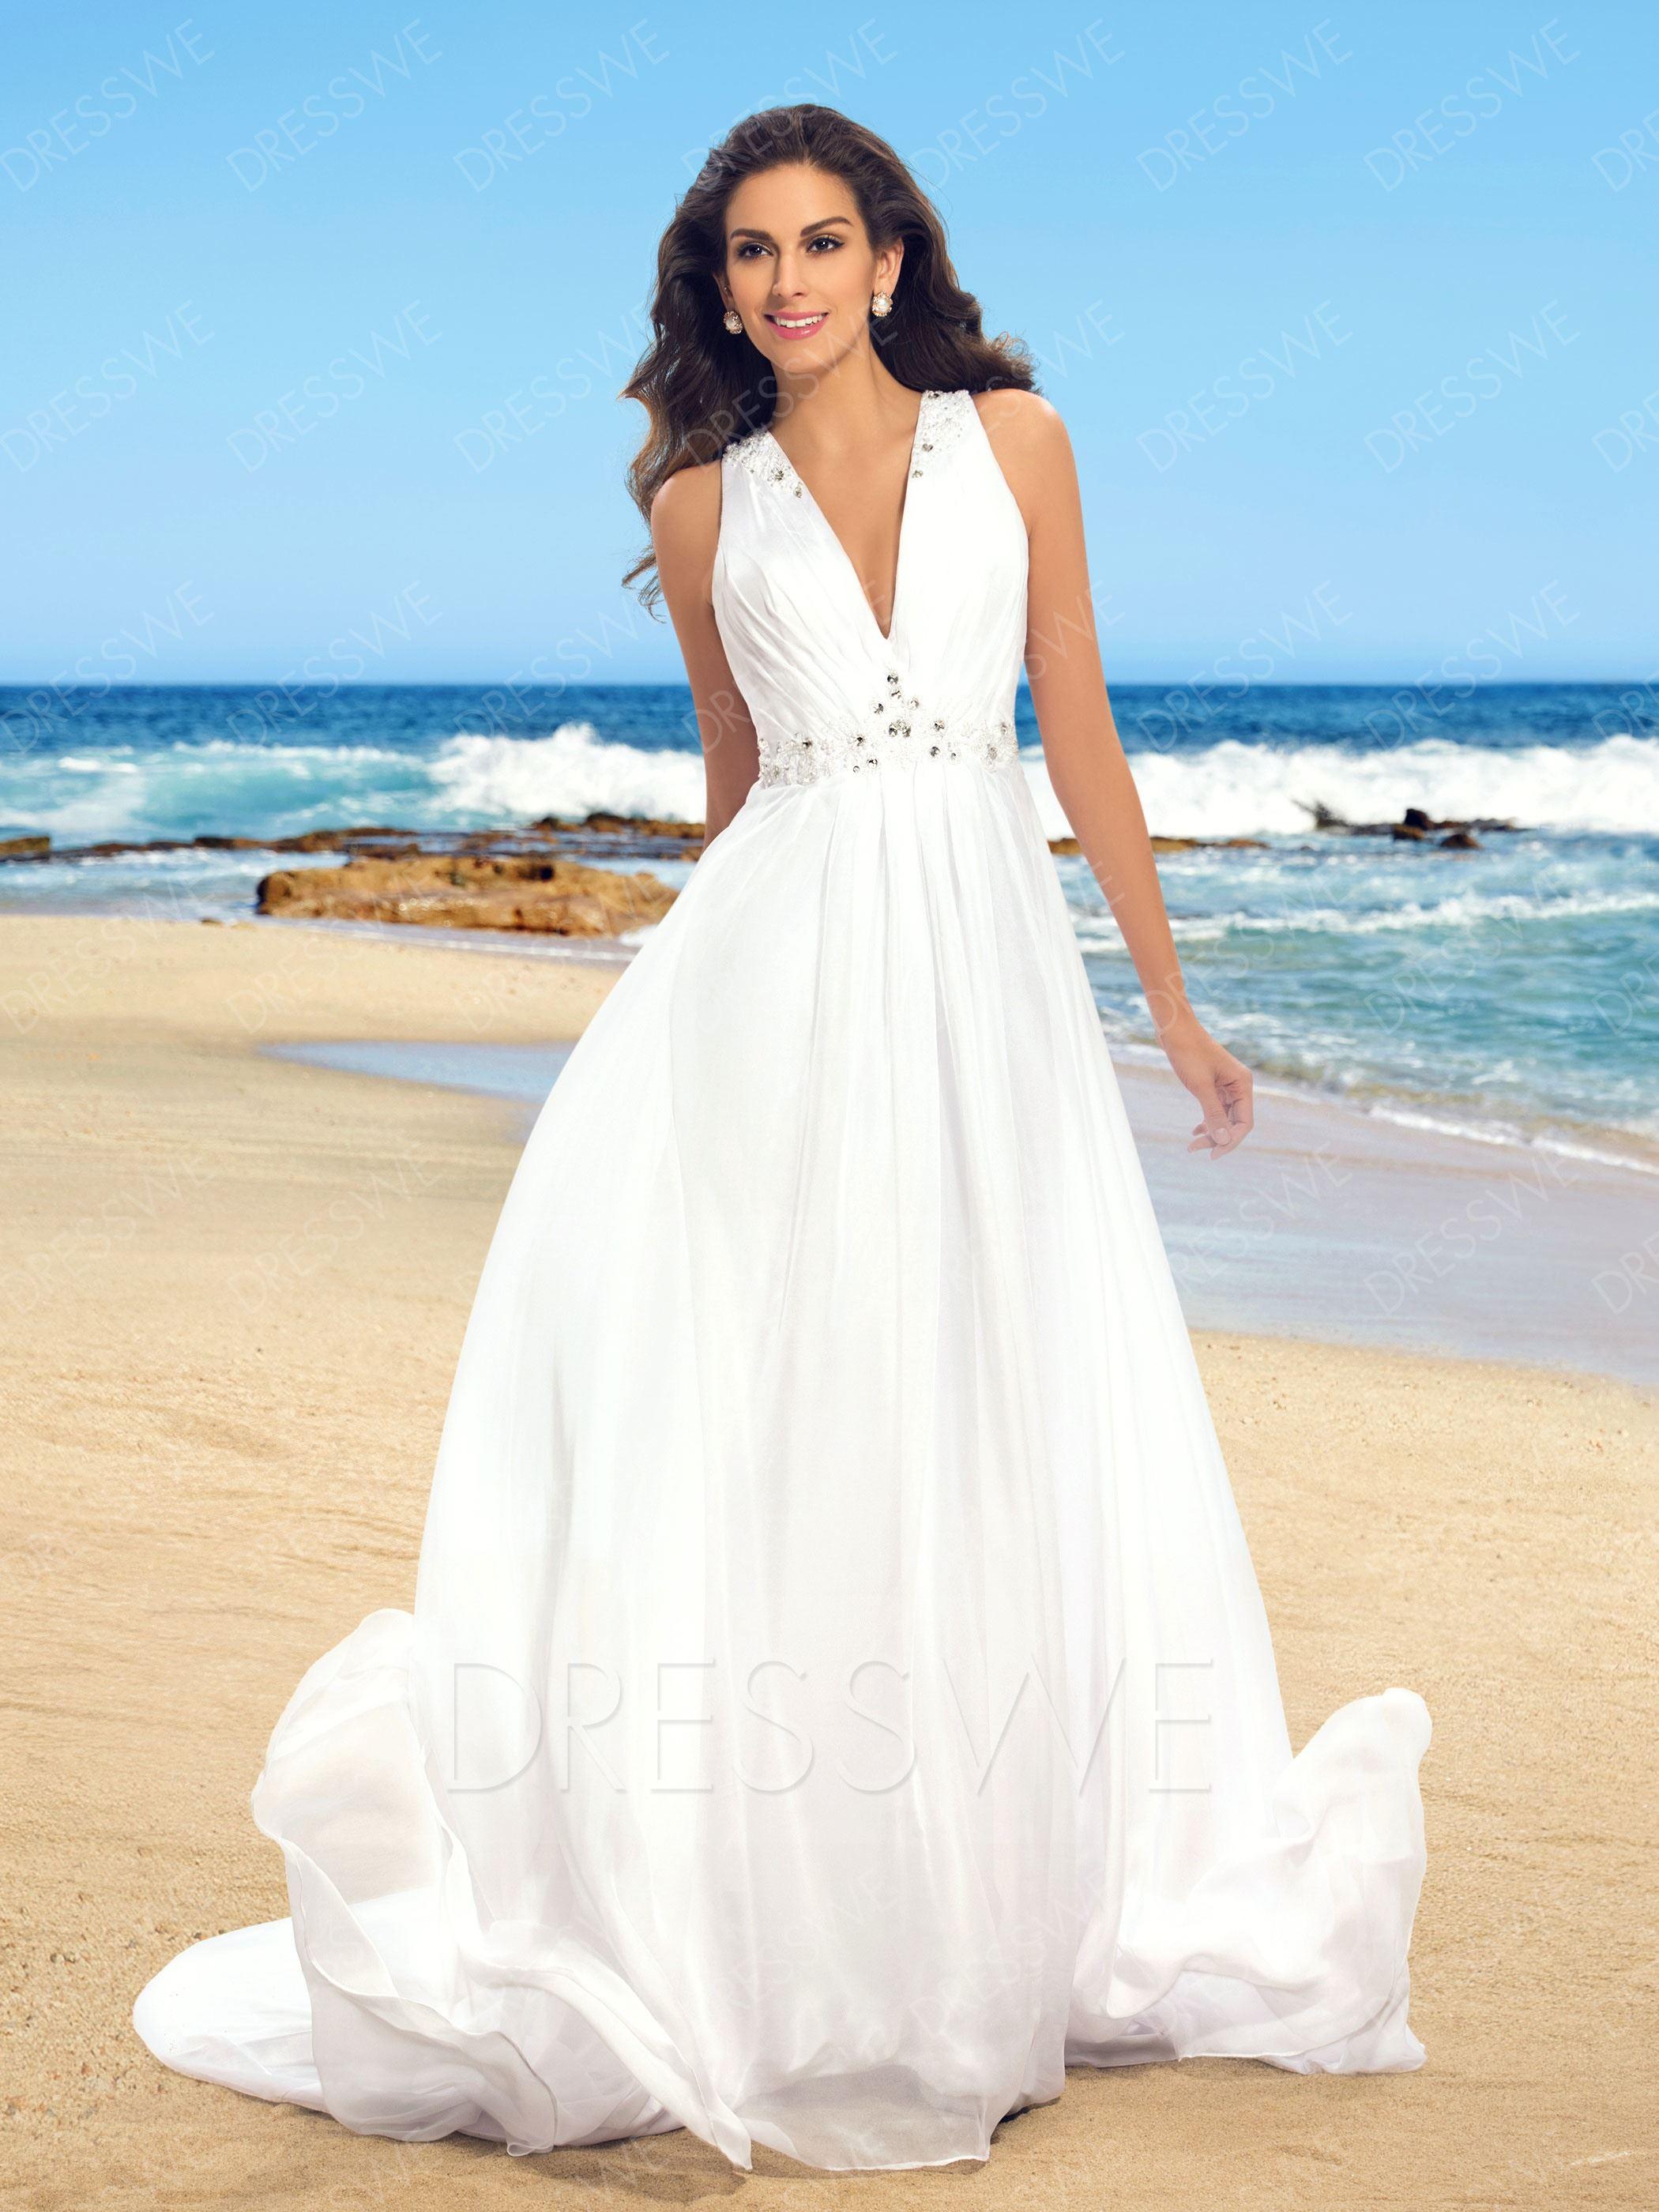 beach wedding dress picture: dresswe.com supplies simple v-neck beaded sheer back beach wedding  dress beach wedding ... CYEUTSP